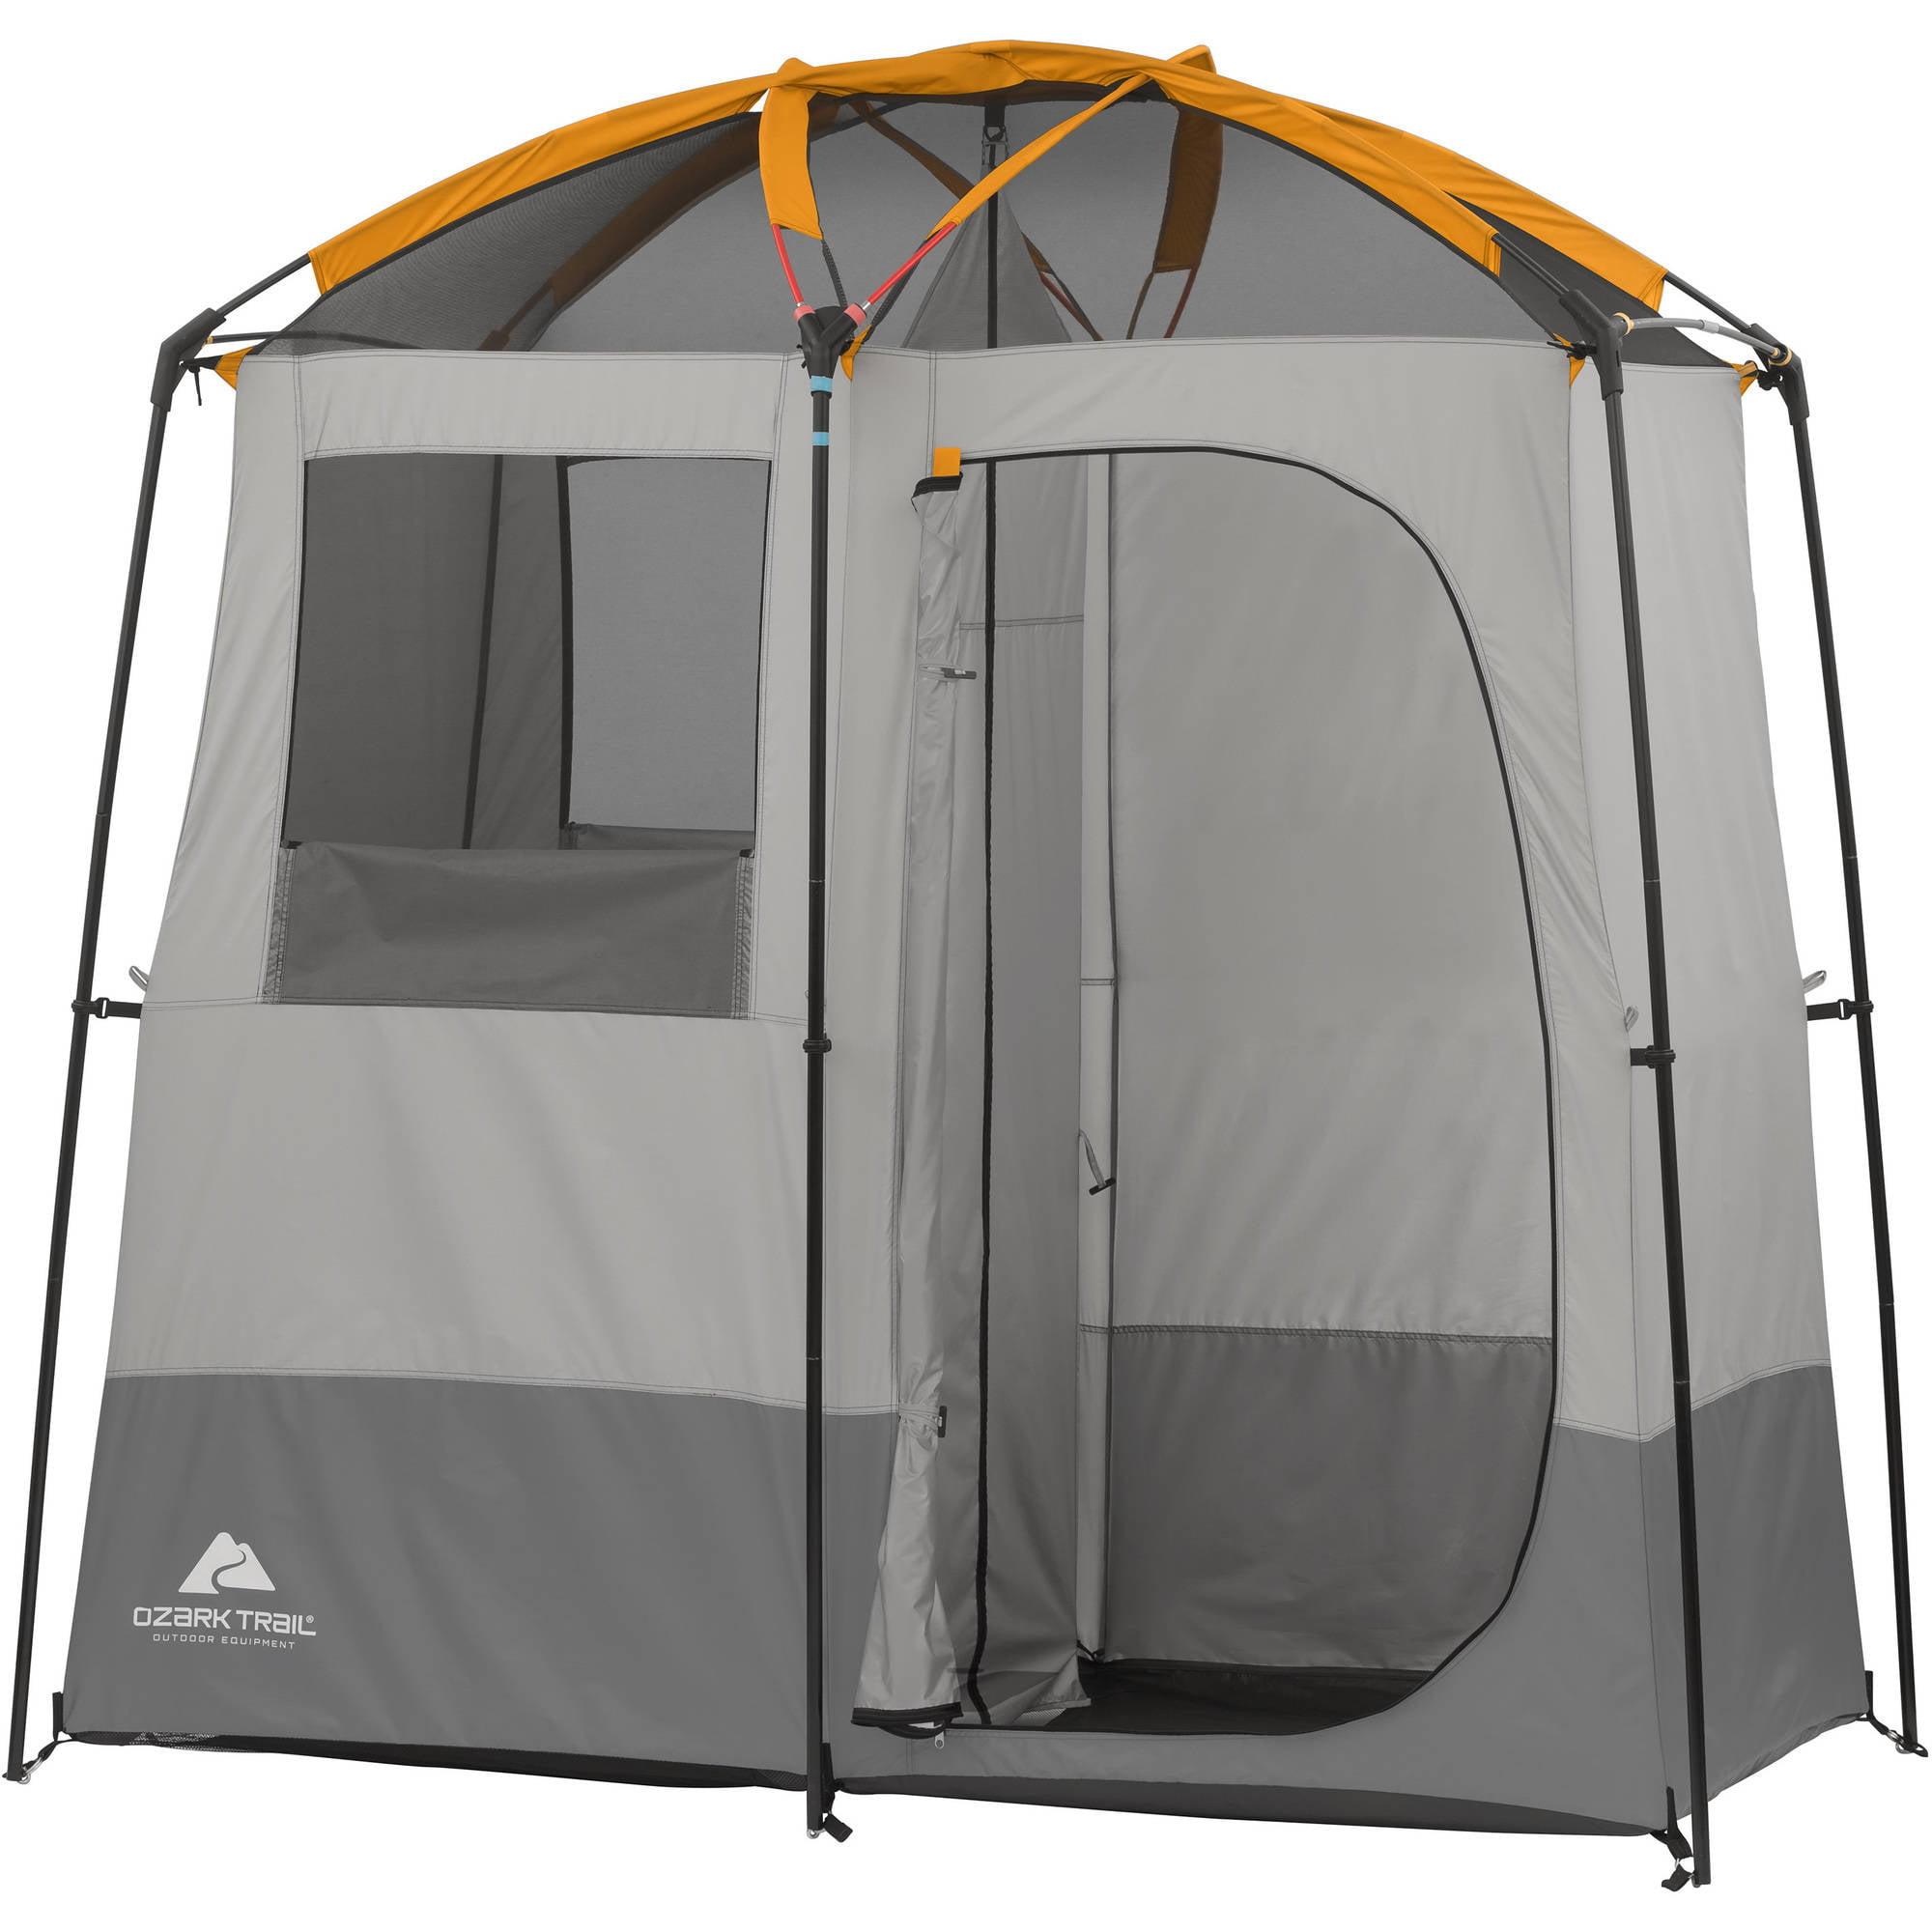 Details about Ozark Portable Solar Heated Changing/Utility Room Shower Tent  sc 1 st  eBay & Ozark Portable Solar Heated Changing/Utility Room Shower Tent ...